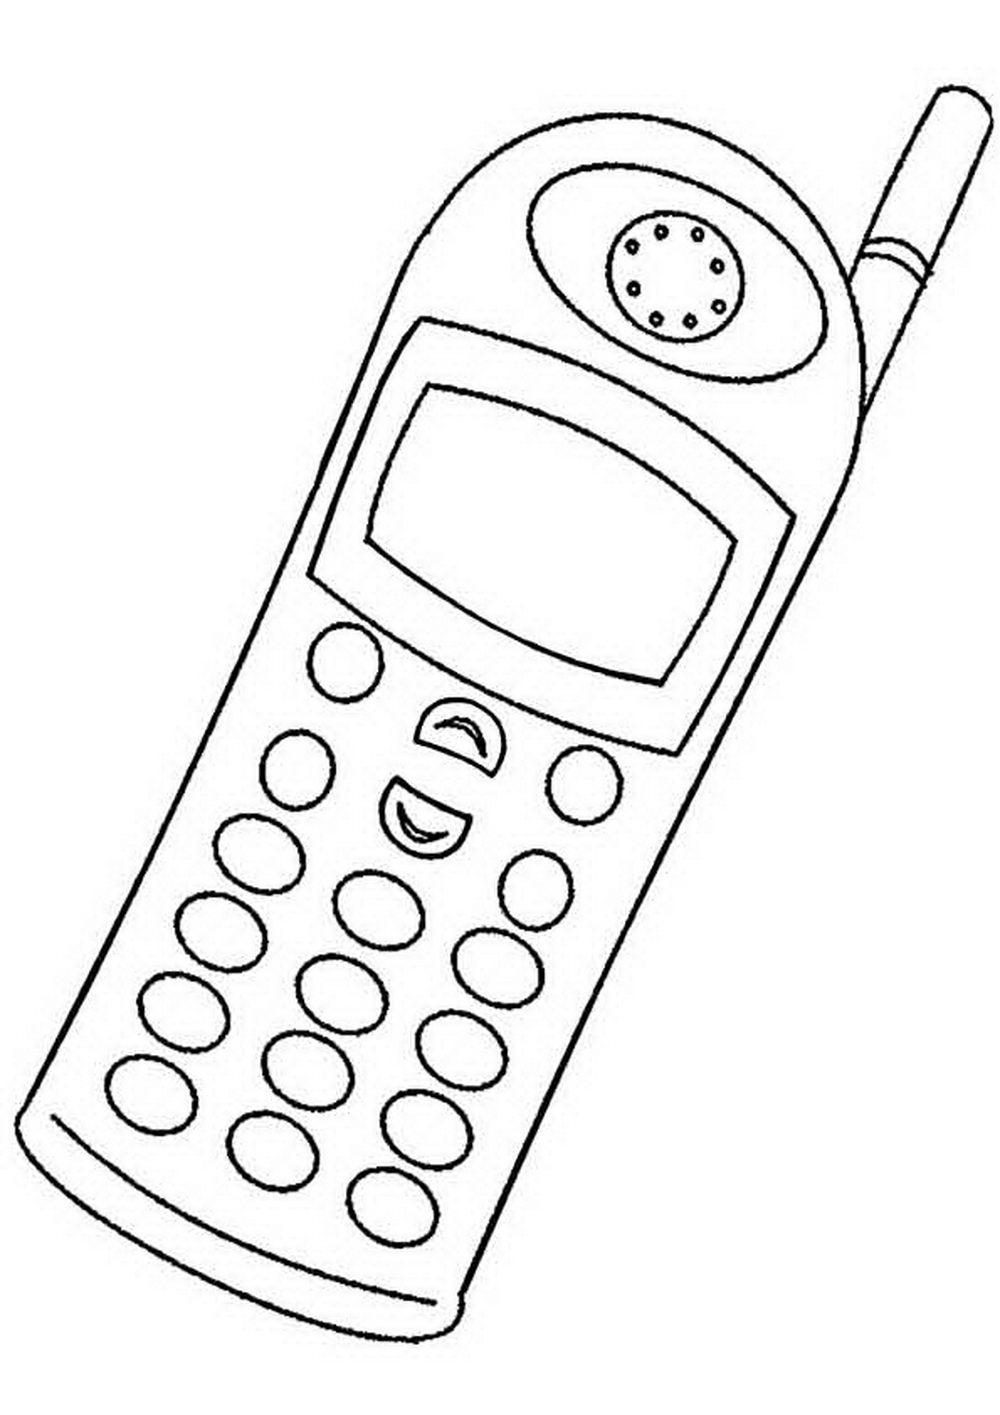 картинки телефонов рисунки